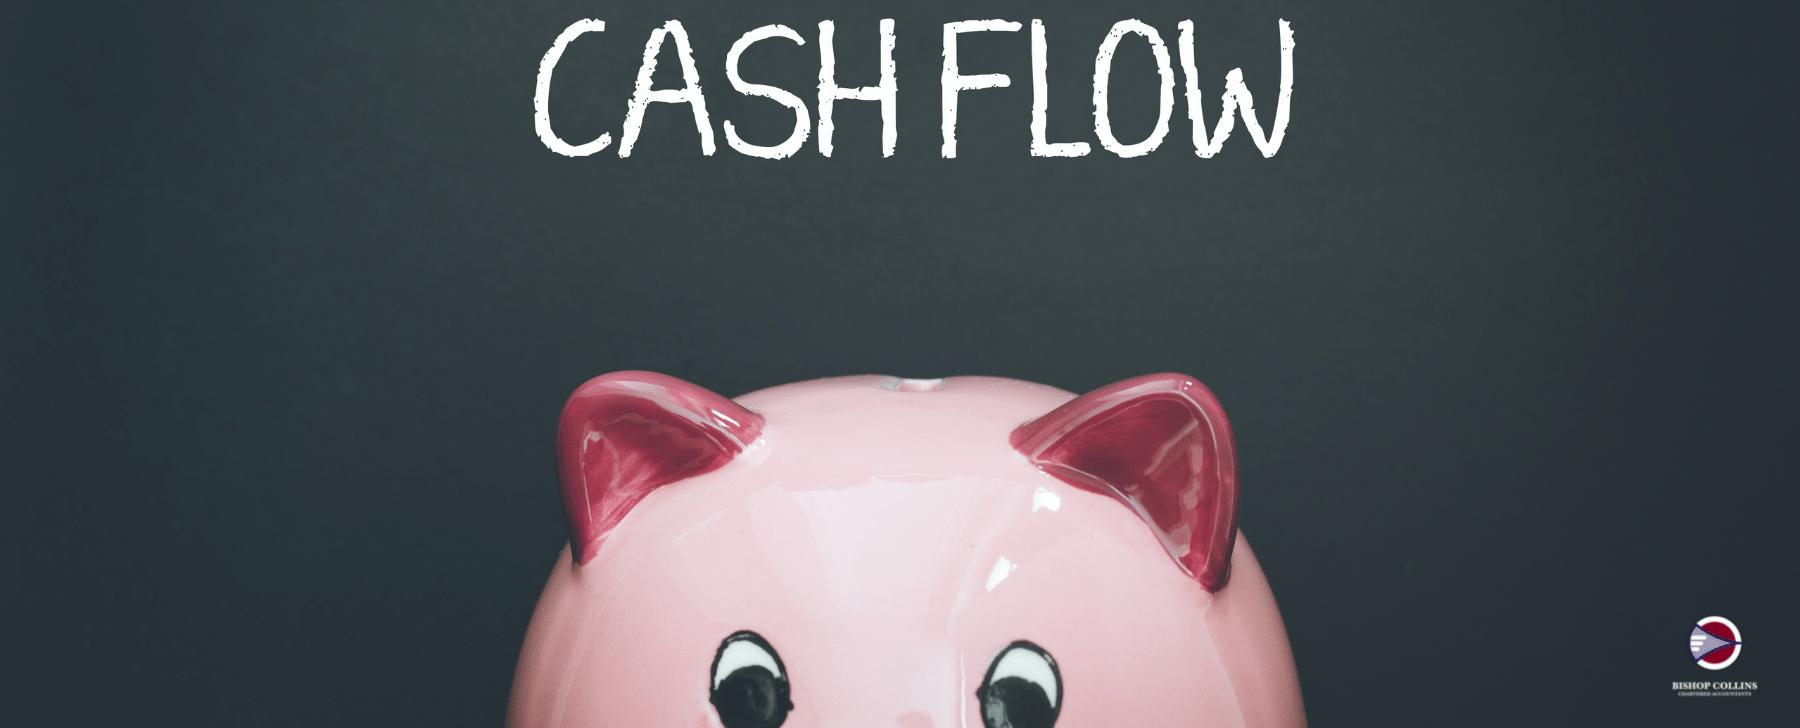 cashflow pig